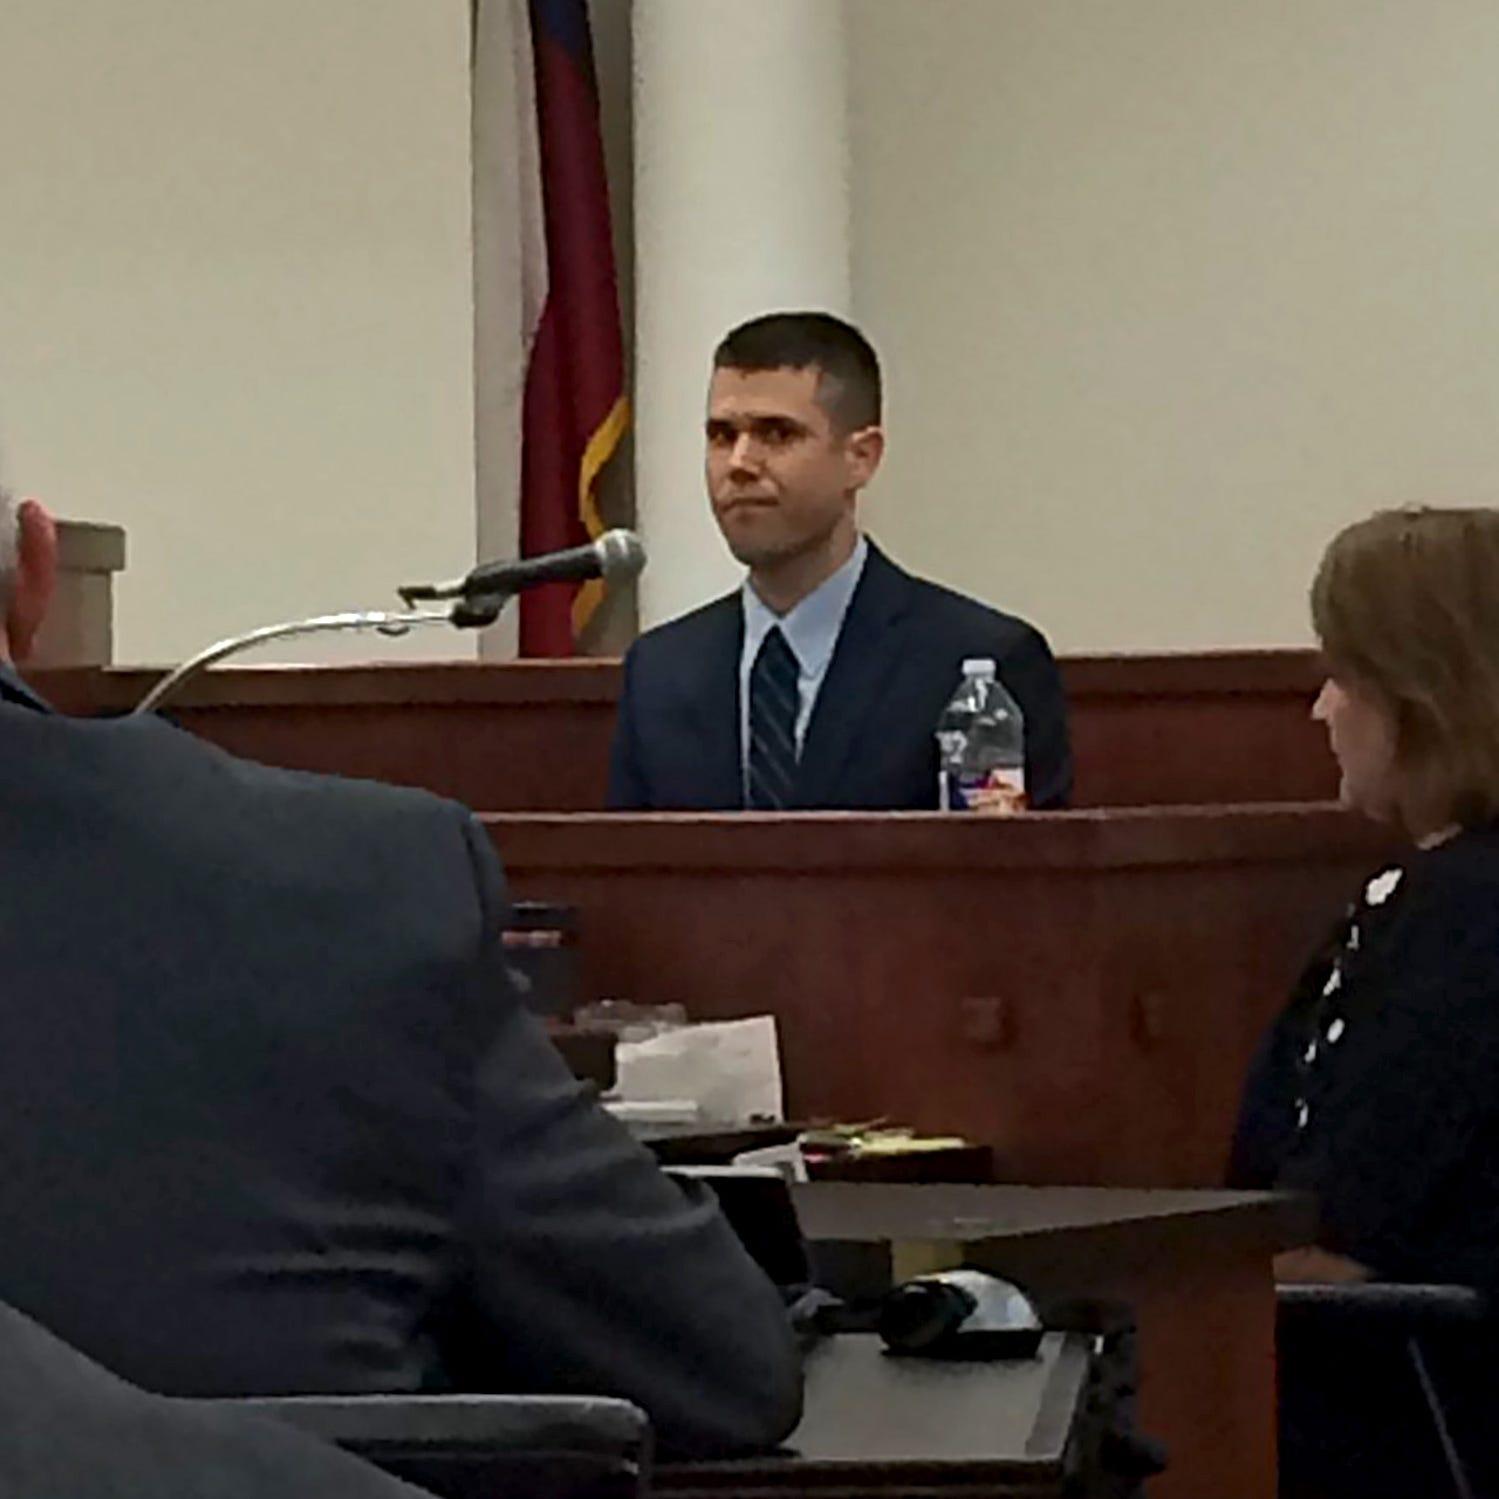 Insanity defense at centerstage in Kody Lott murder trial